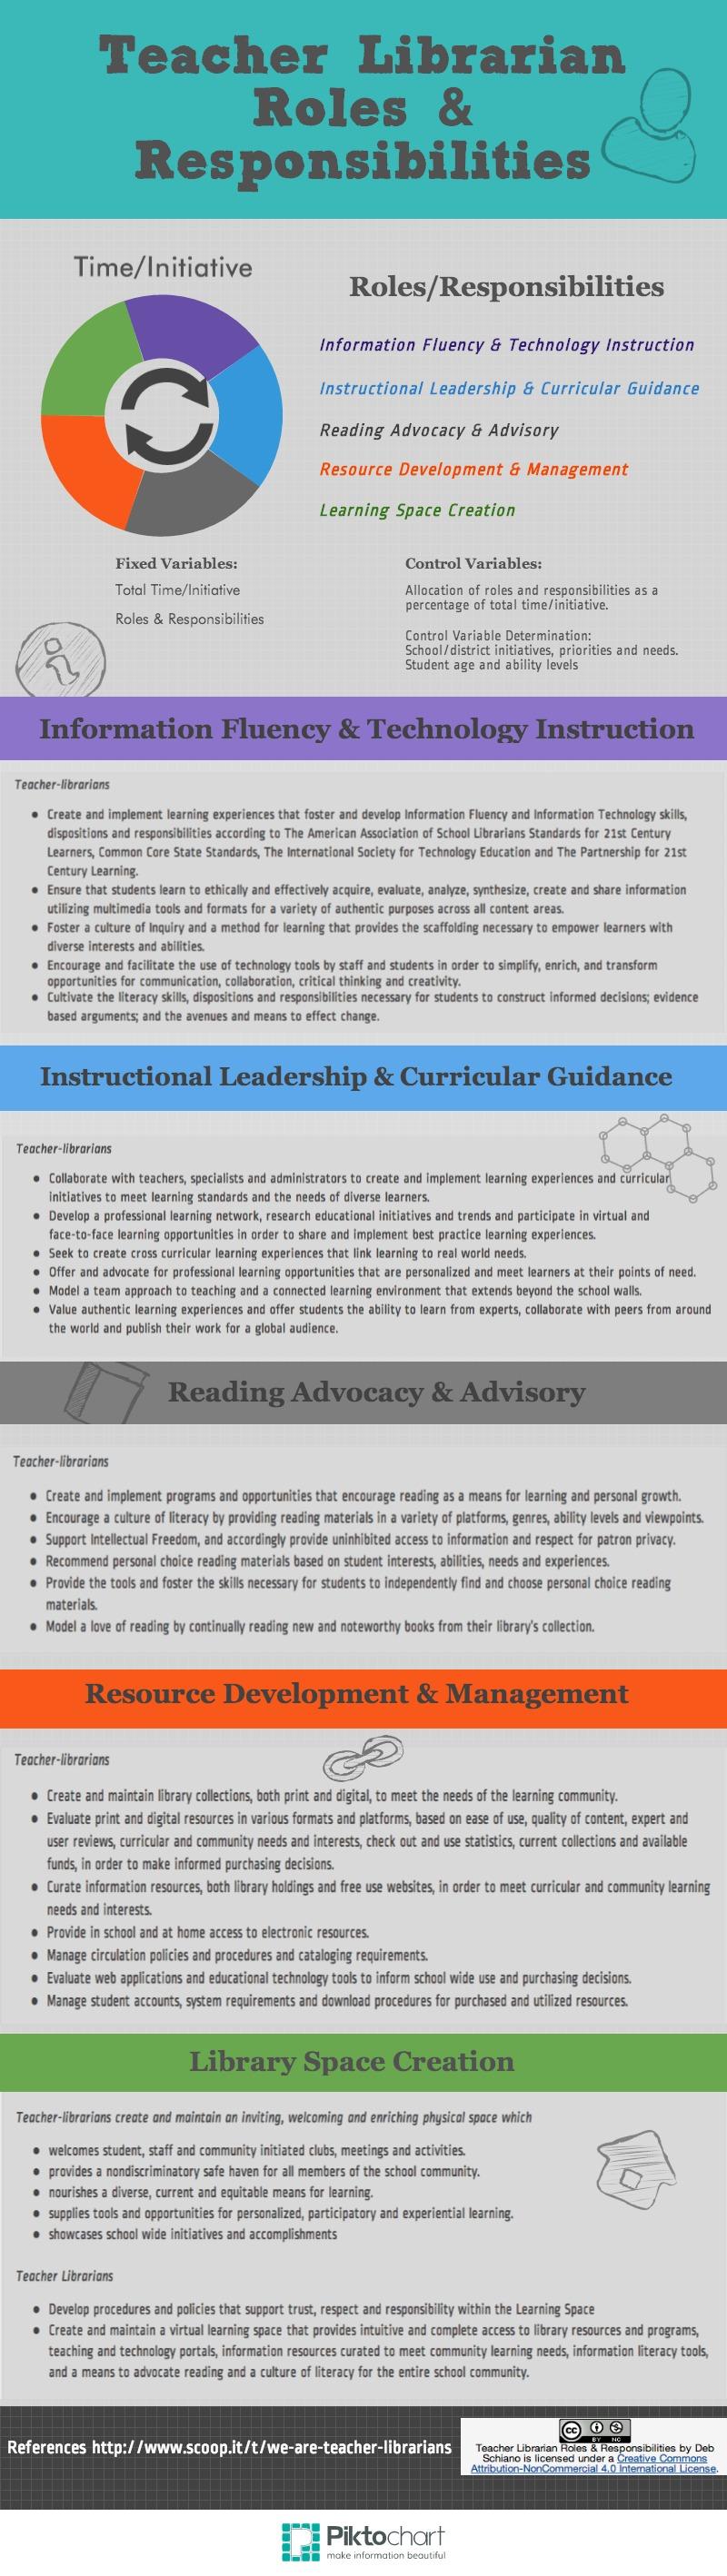 Teacher Librarian Roles | Piktochart Infographic Editor | School ...